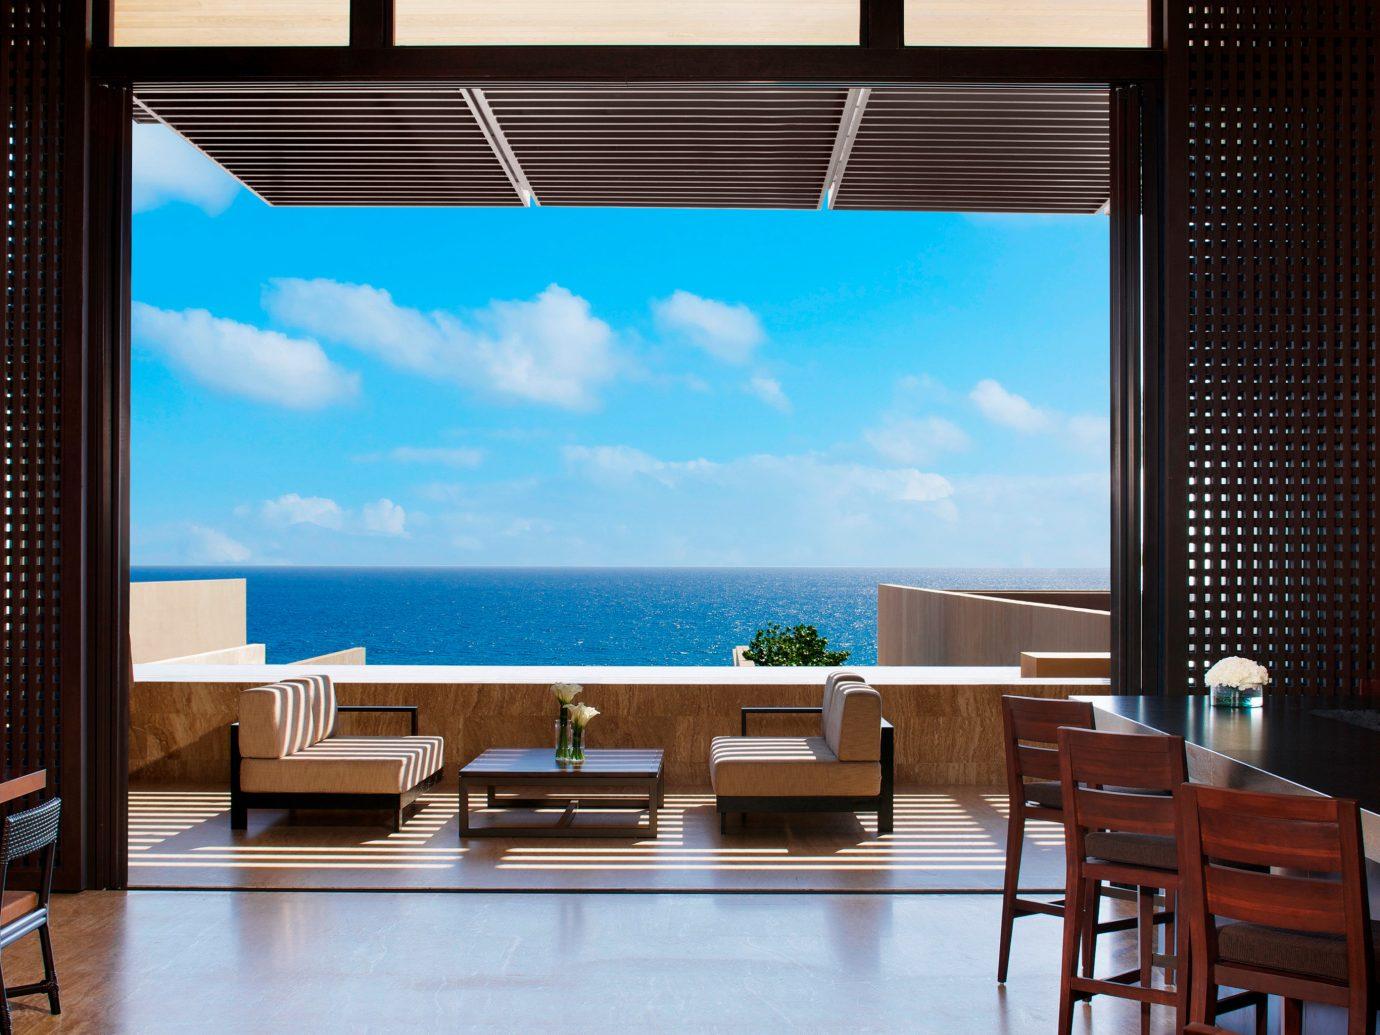 Budget Hotels Romance Trip Ideas floor window chair indoor room property condominium interior design window covering home Design estate furniture living room